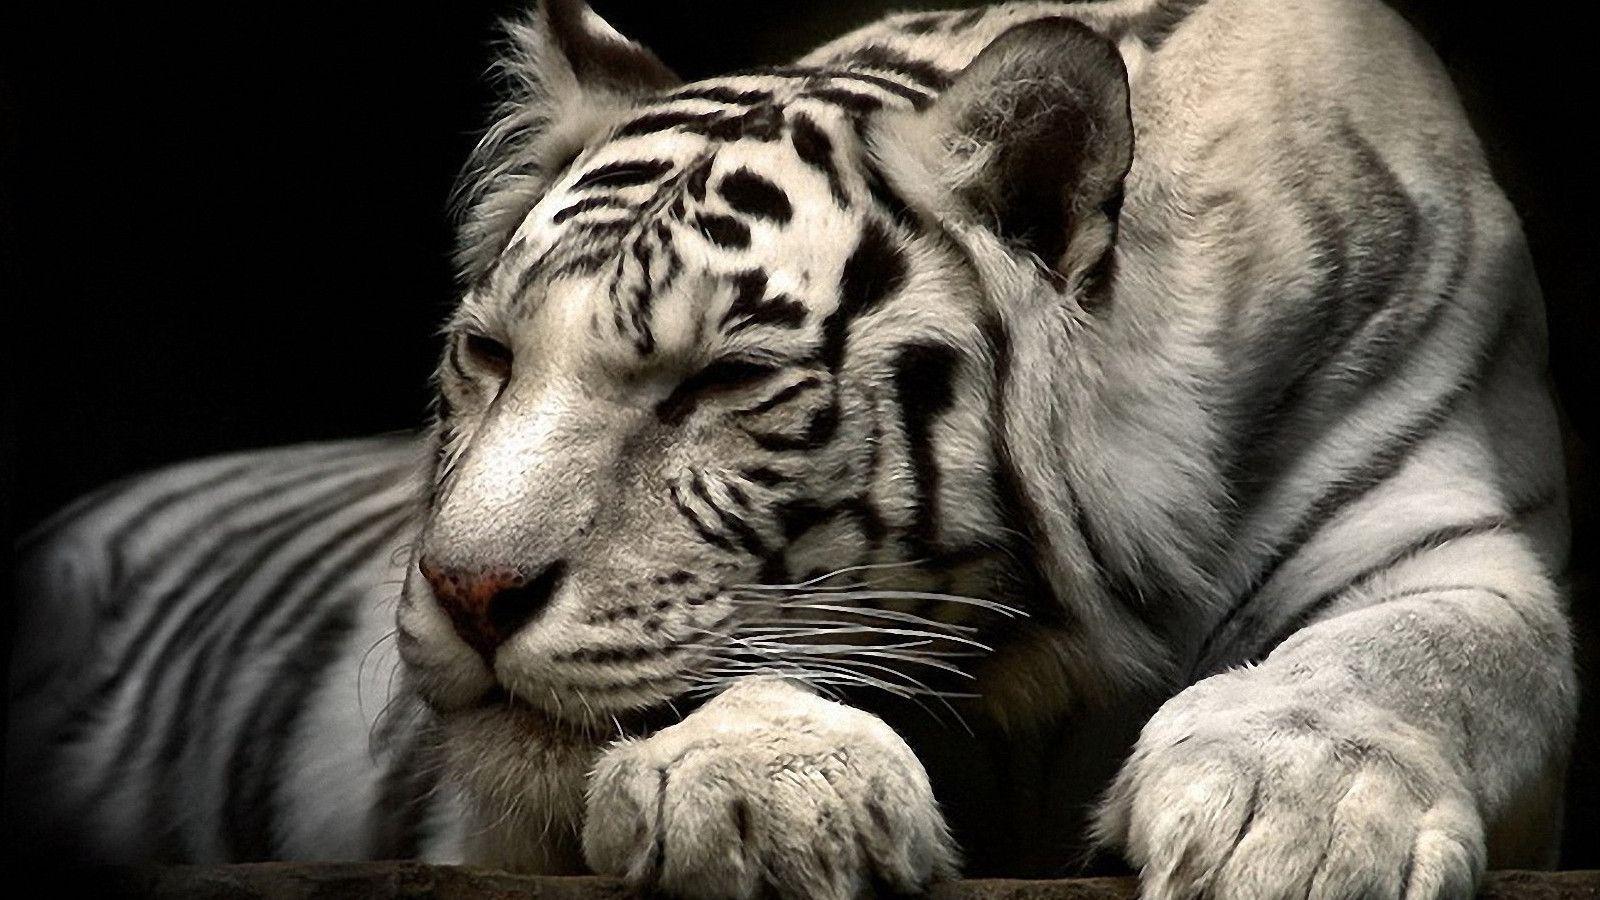 Tiger Wallpaper Hd Siberian White Tiger Hd Wallpaper 3268 Ssofc Animal Kingdom Disney Animals Most Endangered Animals